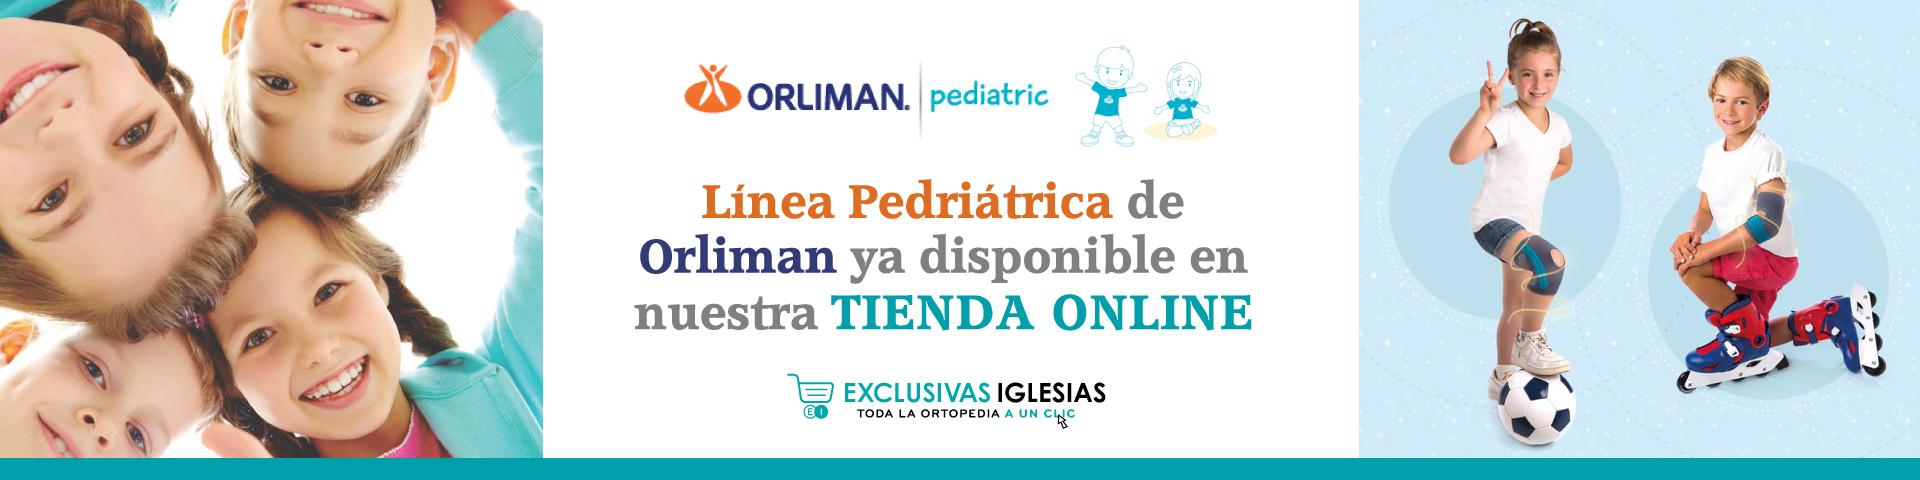 Linea de ortopedia infantil